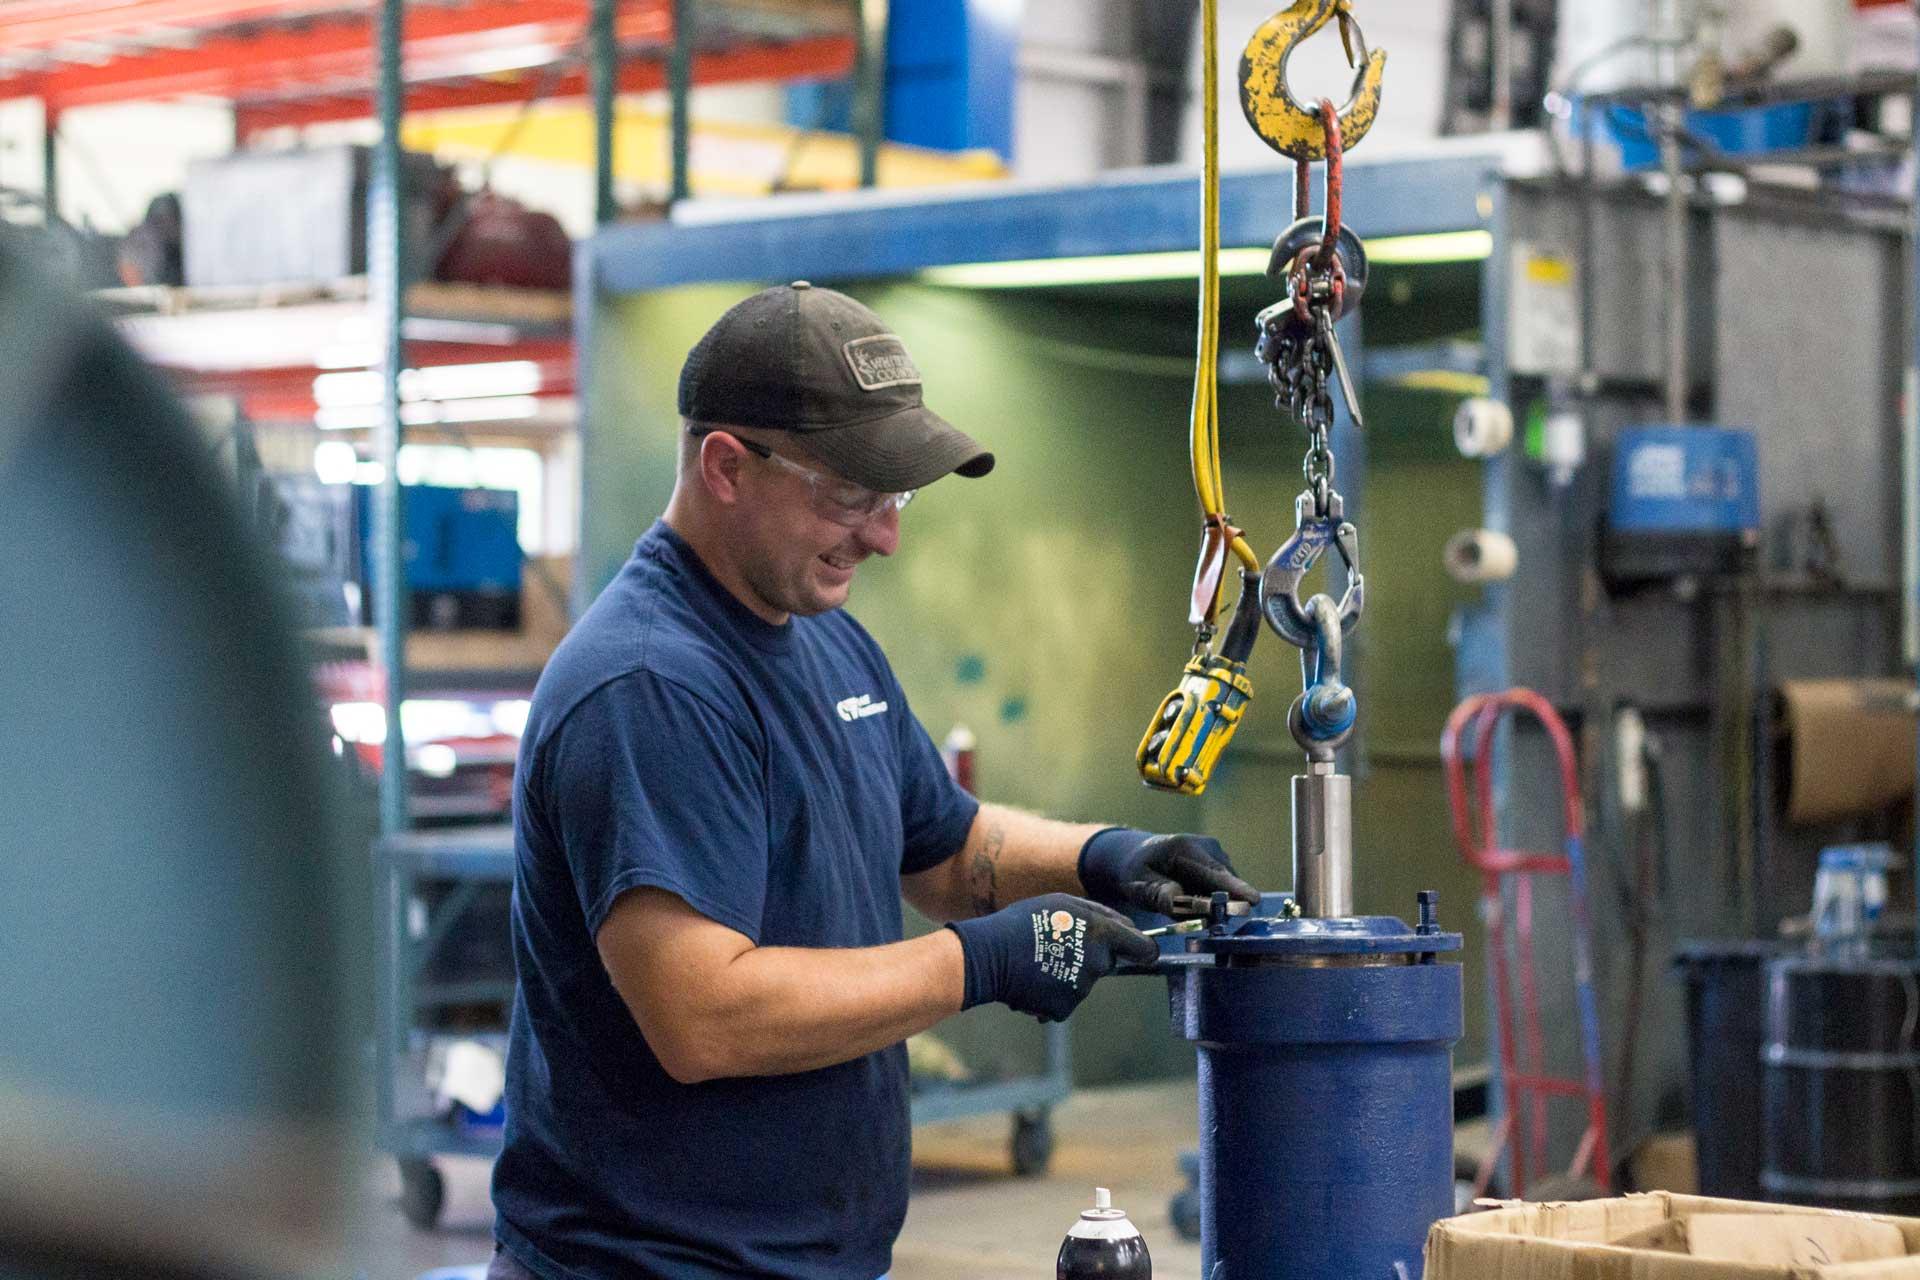 crane_employee_working_on_part